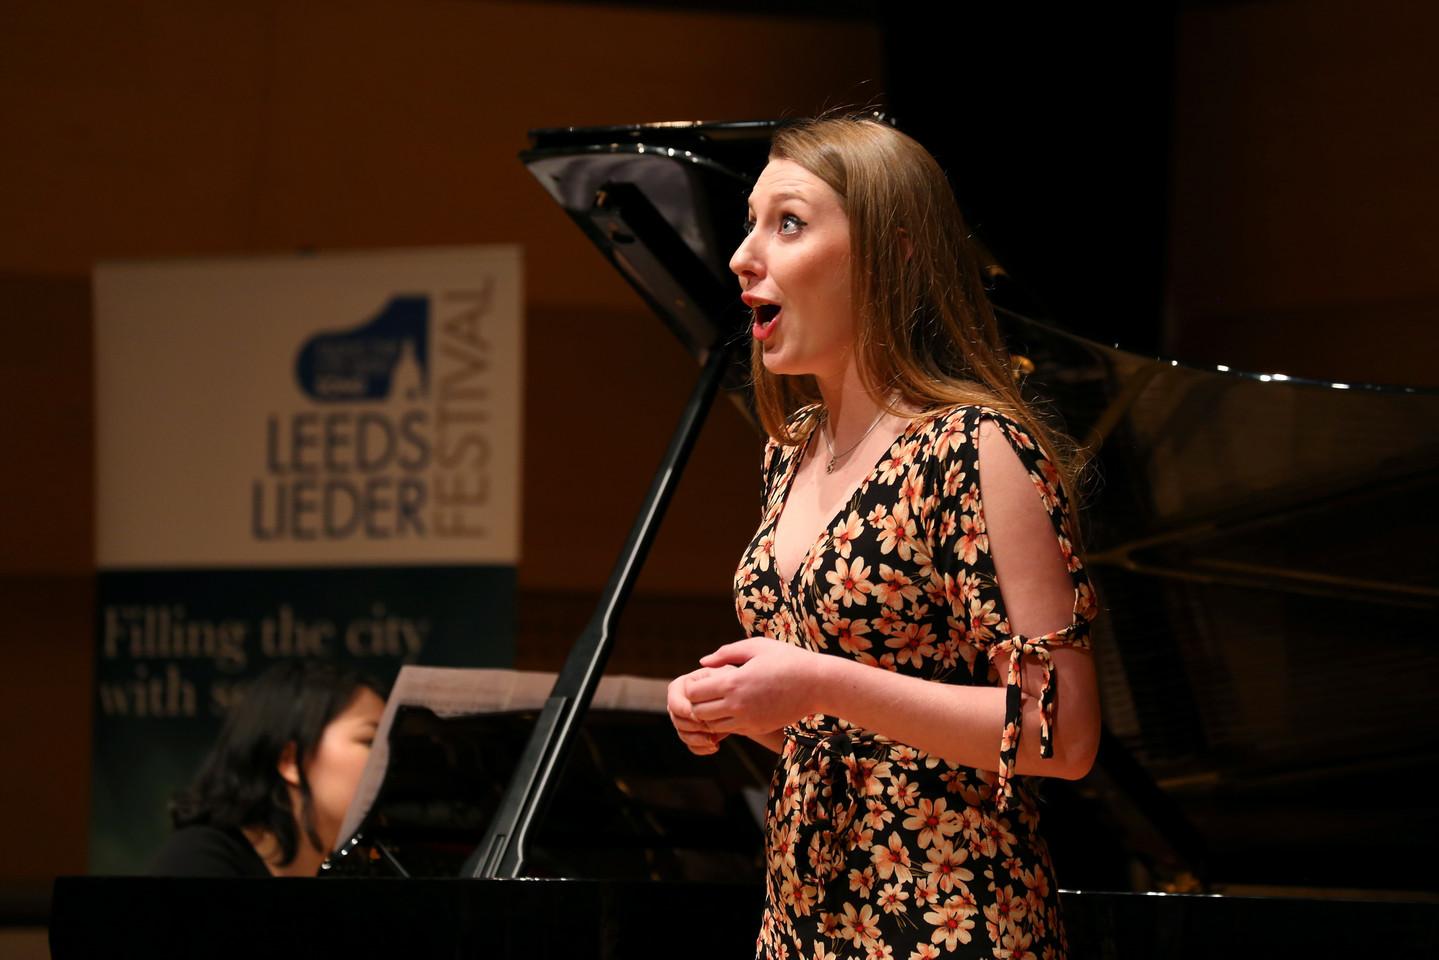 Leeds Lieder Young Artists Concert